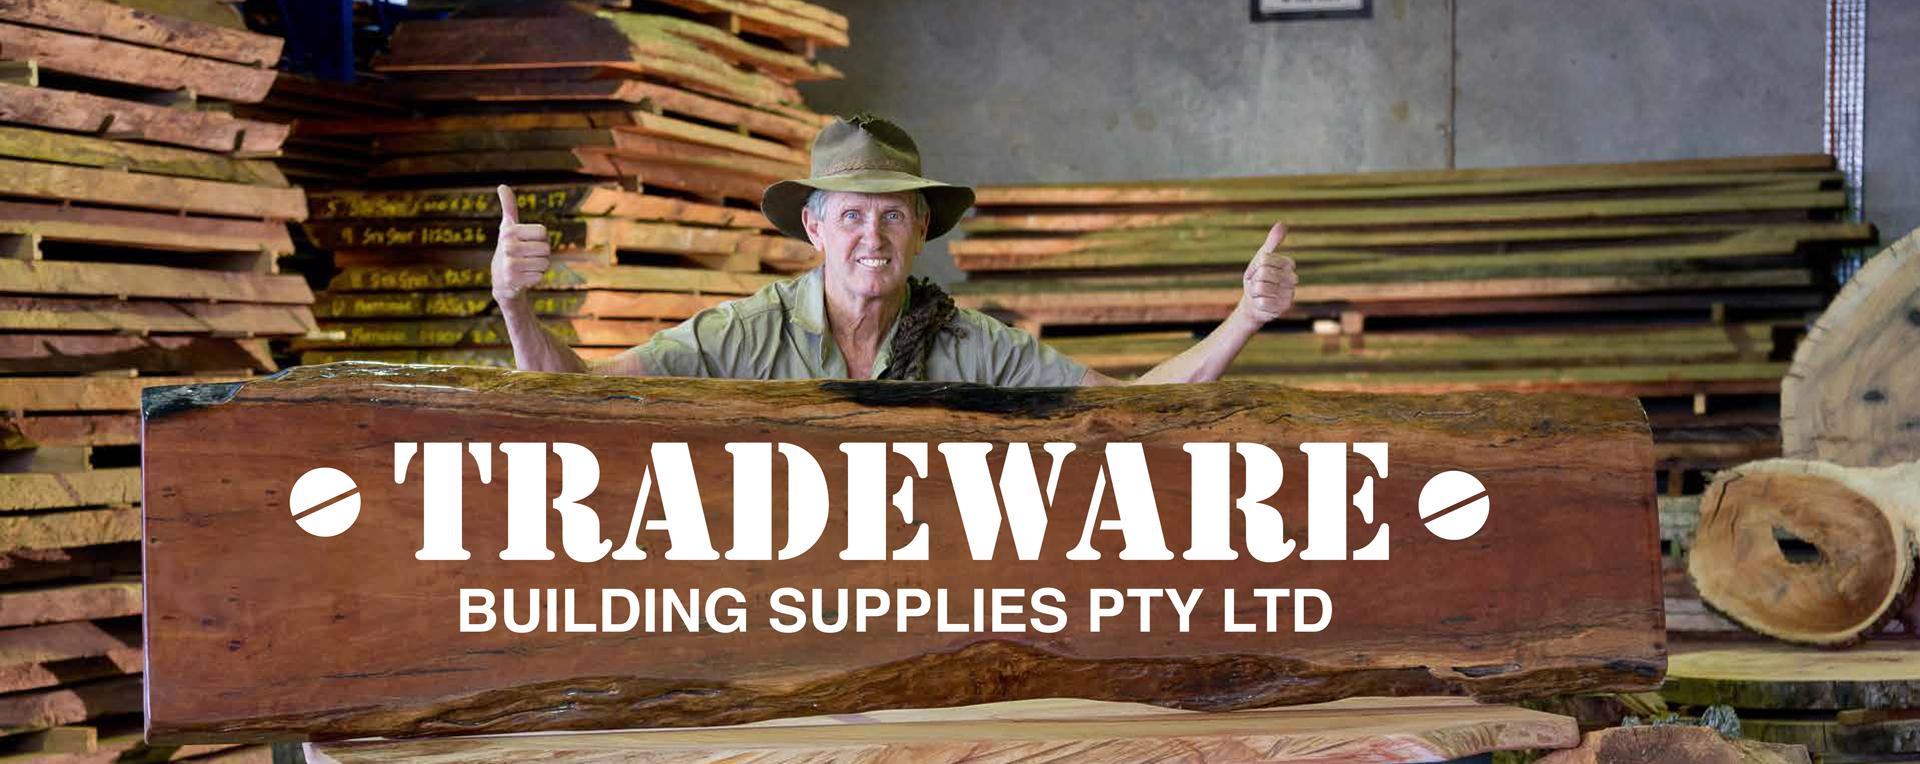 Home - image Tradeware-Building-Supplies_Chandler-Brisbane-with-Logo on http://tradewarebuildingsupplies.com